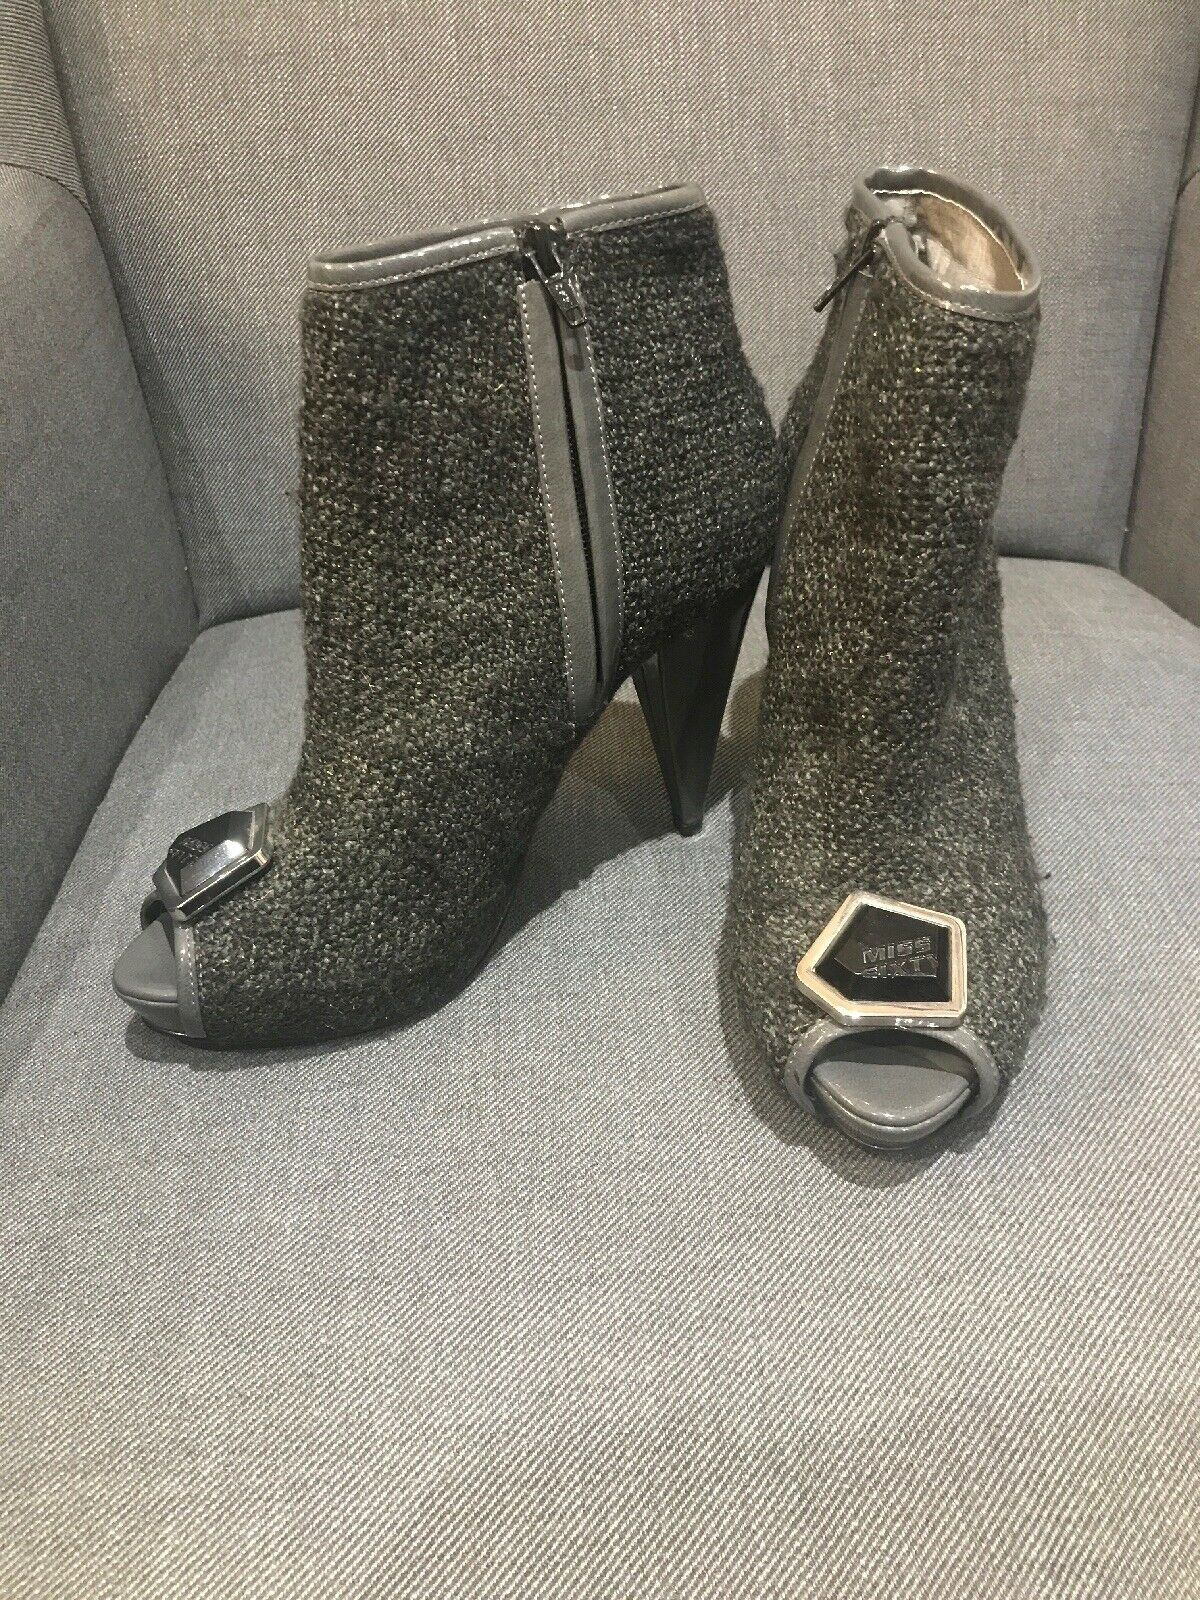 Miss SIXTY gris Boucle tweed estilo Peep Toe Toe Toe Tobillo botas Talla 38 UK Talla 5 d1dba0